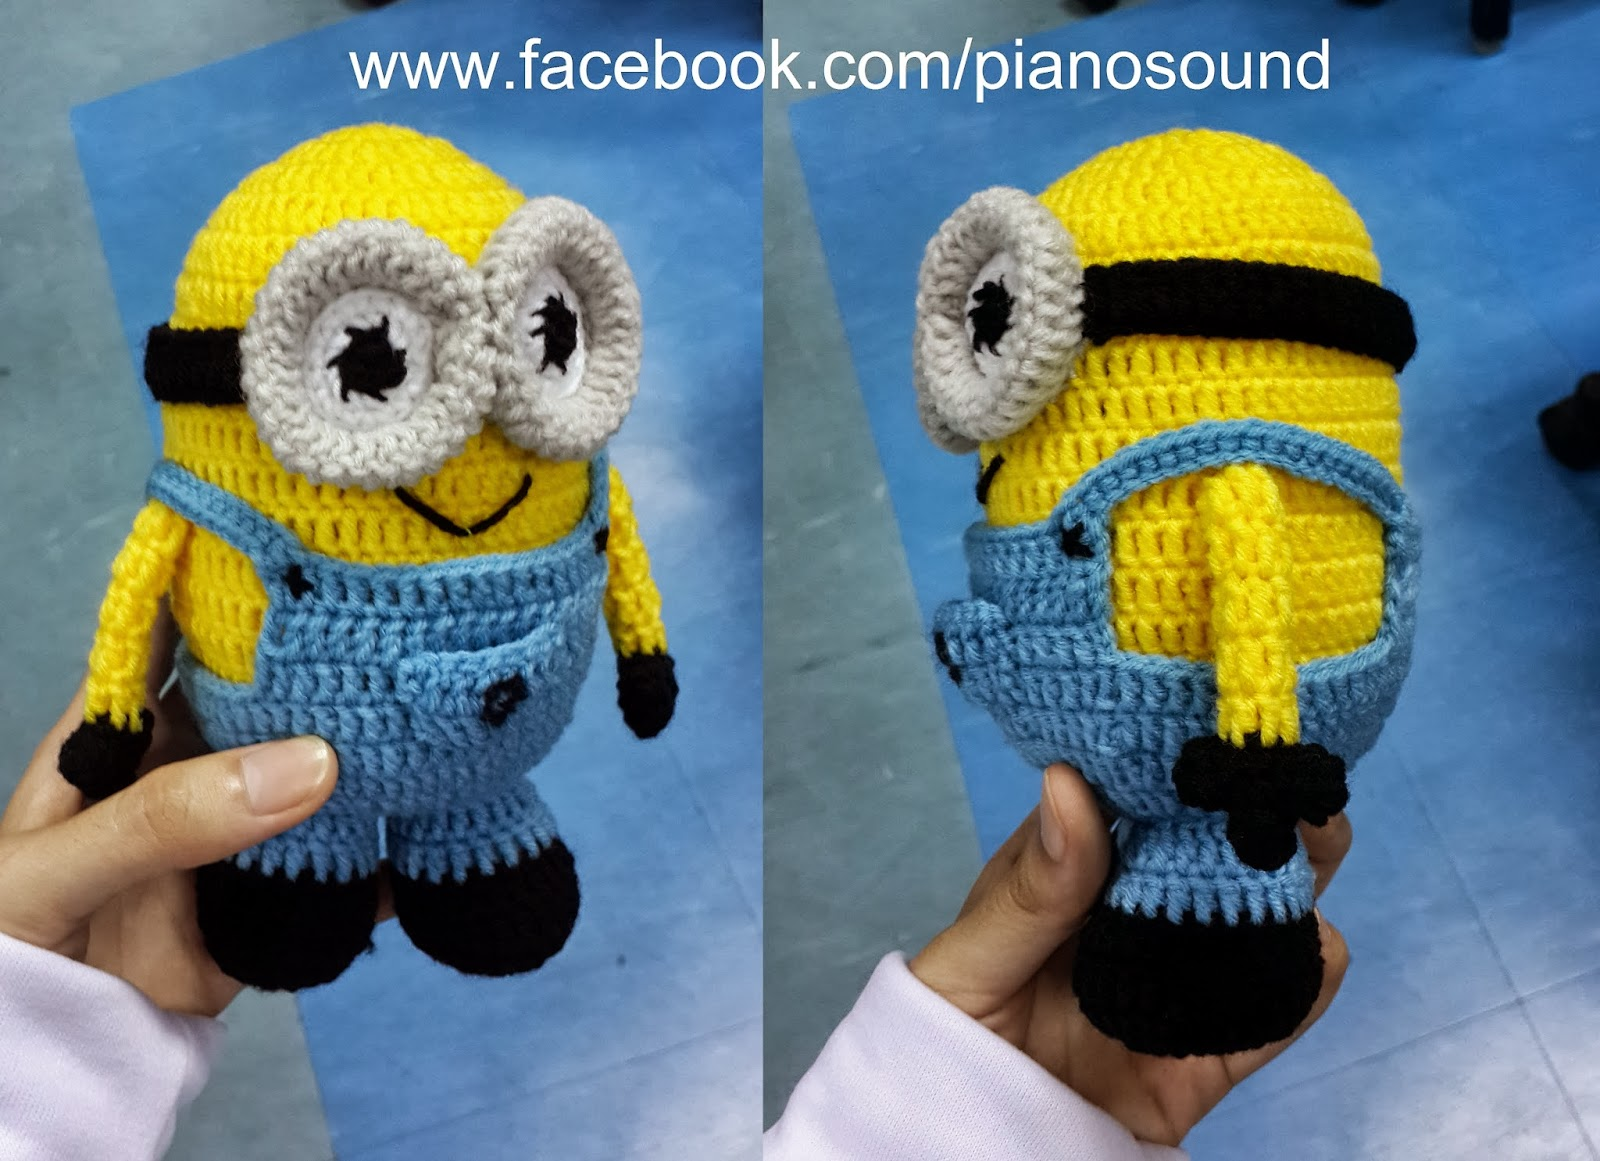 Free Amigurumi Minion : Amigurumipianosound crochet blog: xva free pattern